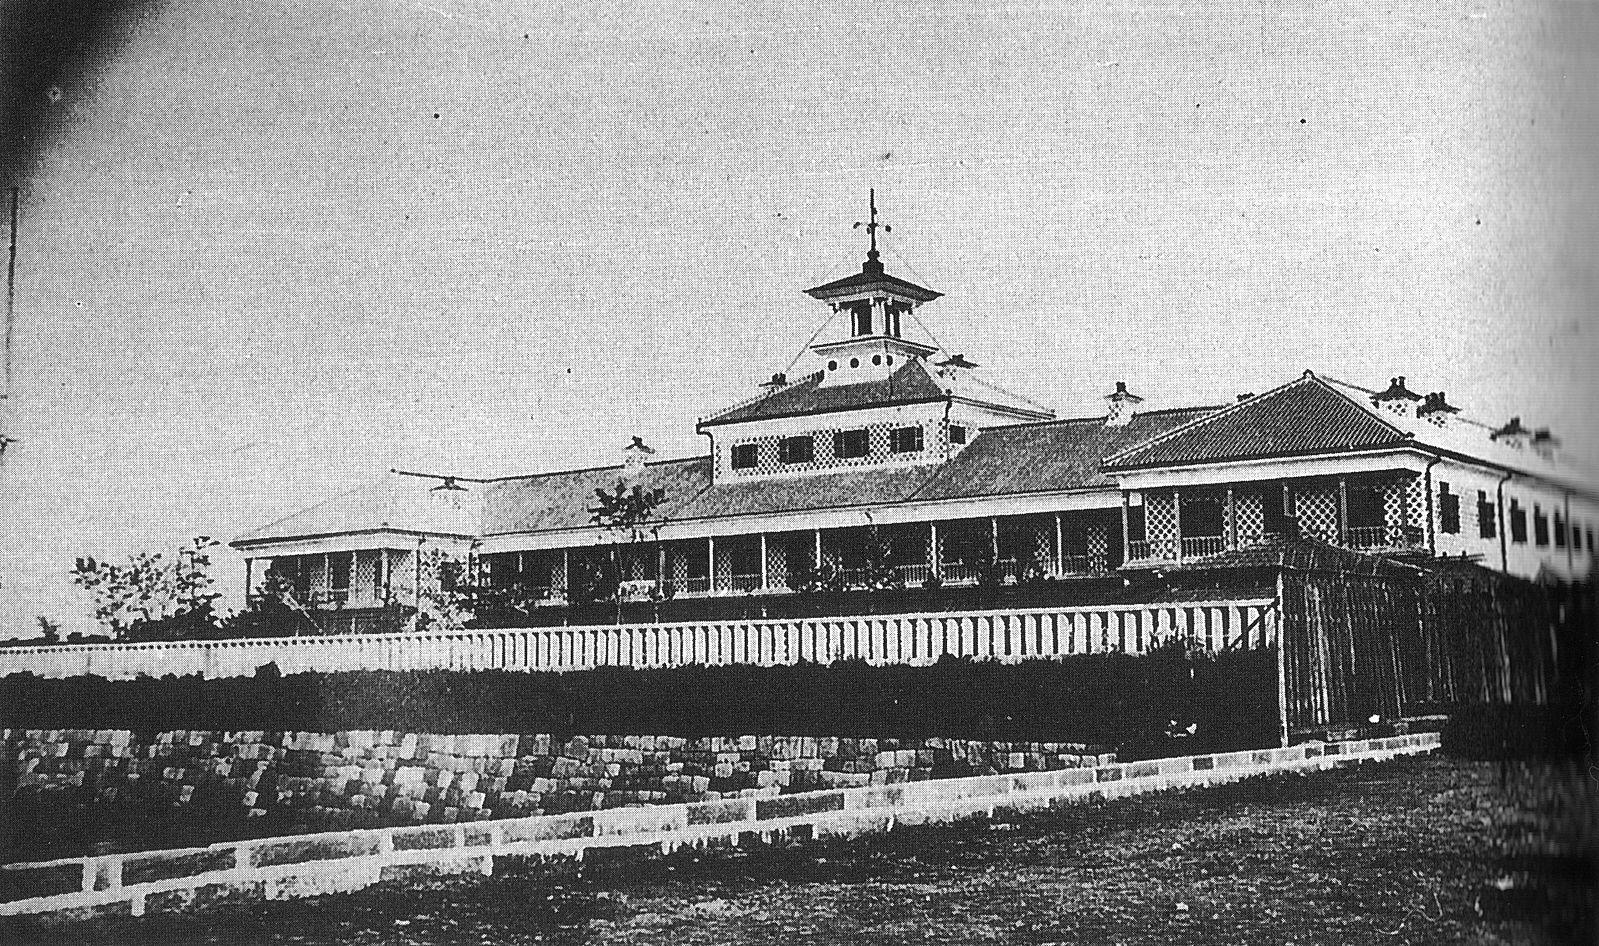 擬洋風建築 築地ホテル館